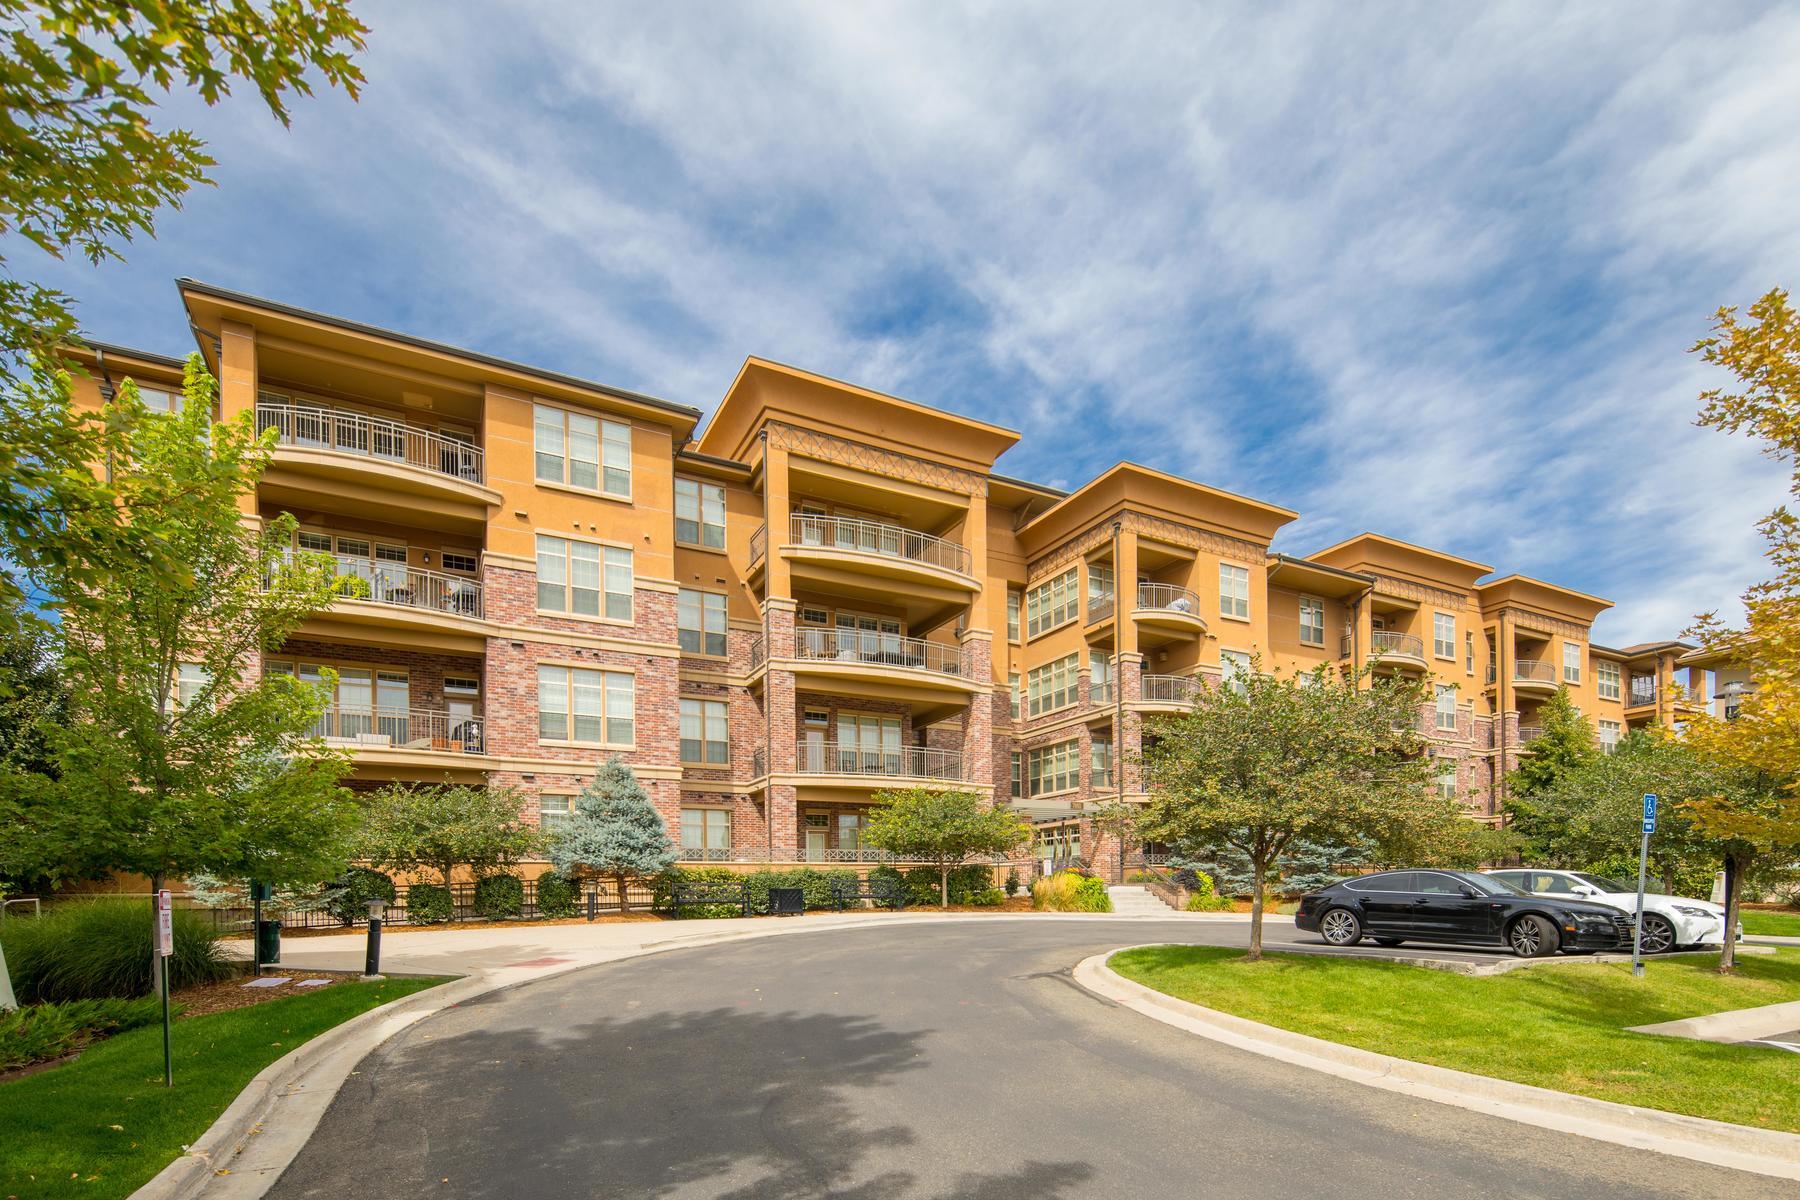 Property for Active at Fabulous Penthouse 7865 Vallagio Lane Unit 412 Englewood, Colorado 80112 United States